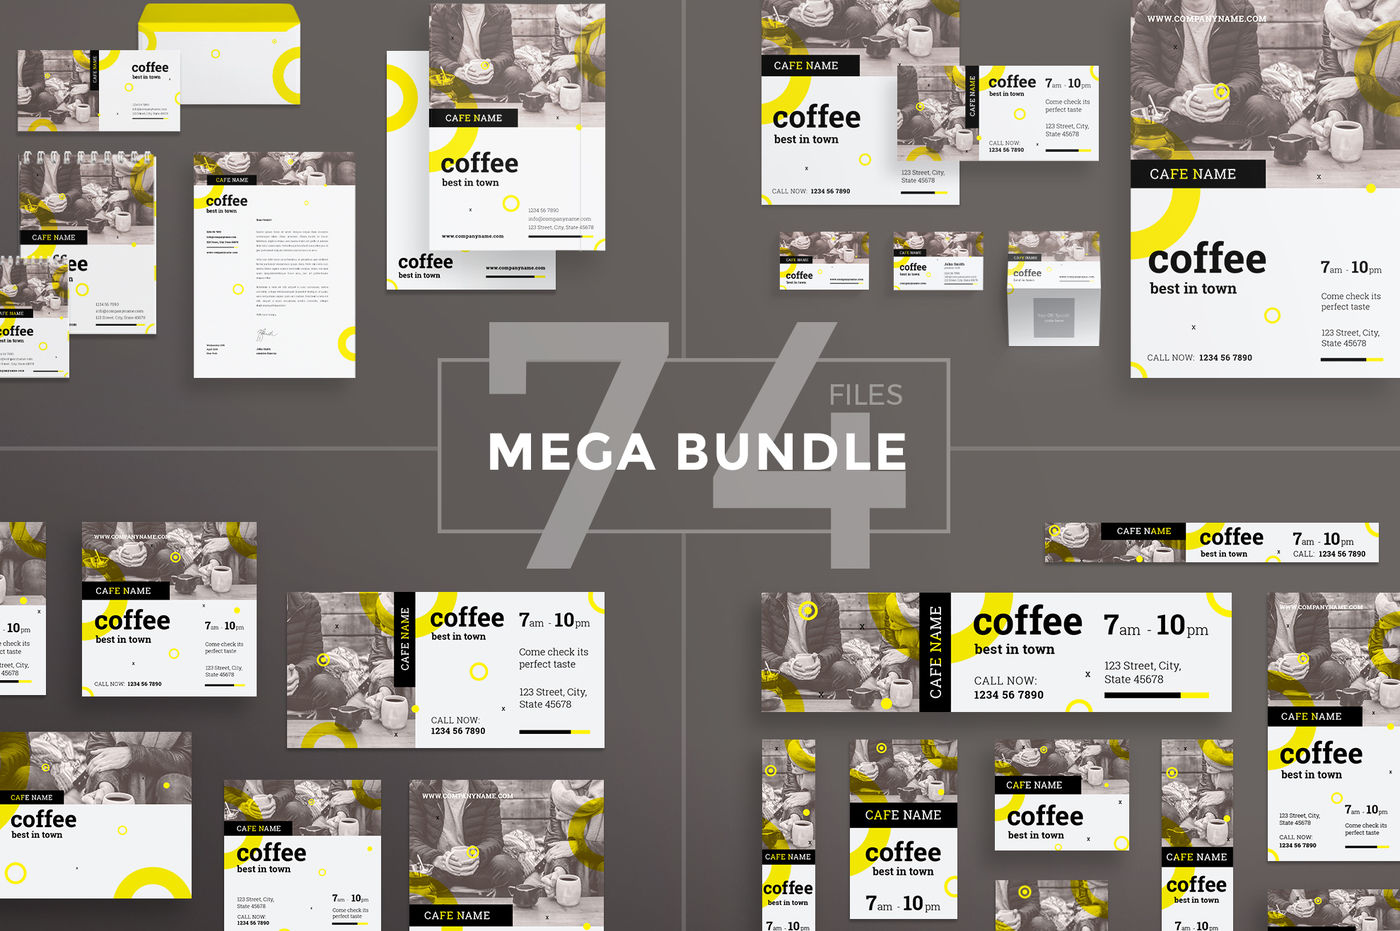 Download Amber Dropper Bottle Kraft Paper Box Mockup Yellowimages